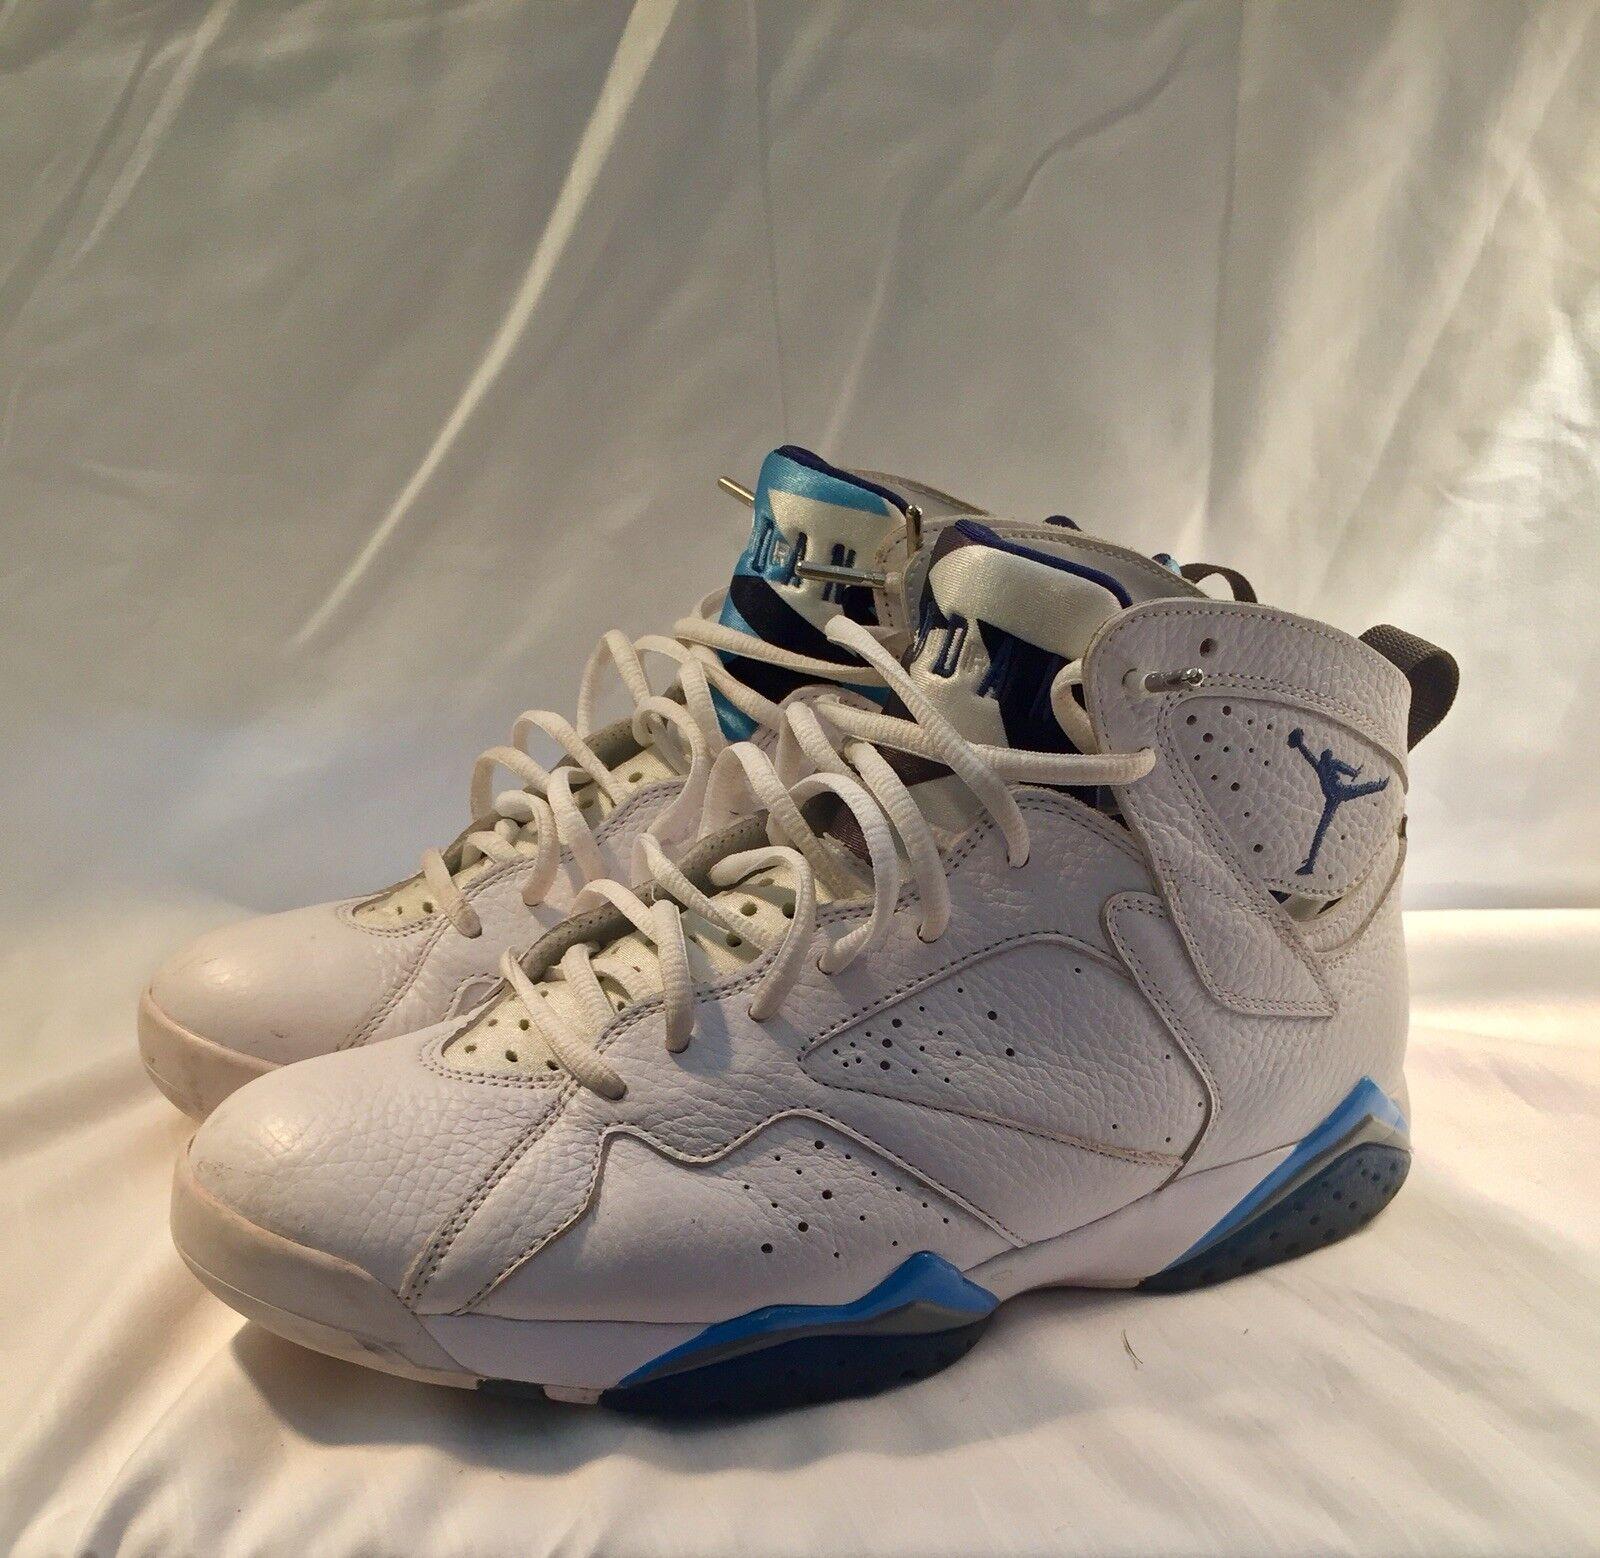 Jordan francese blu 7 retrò nike dimensioni nike autentico basket scarpa